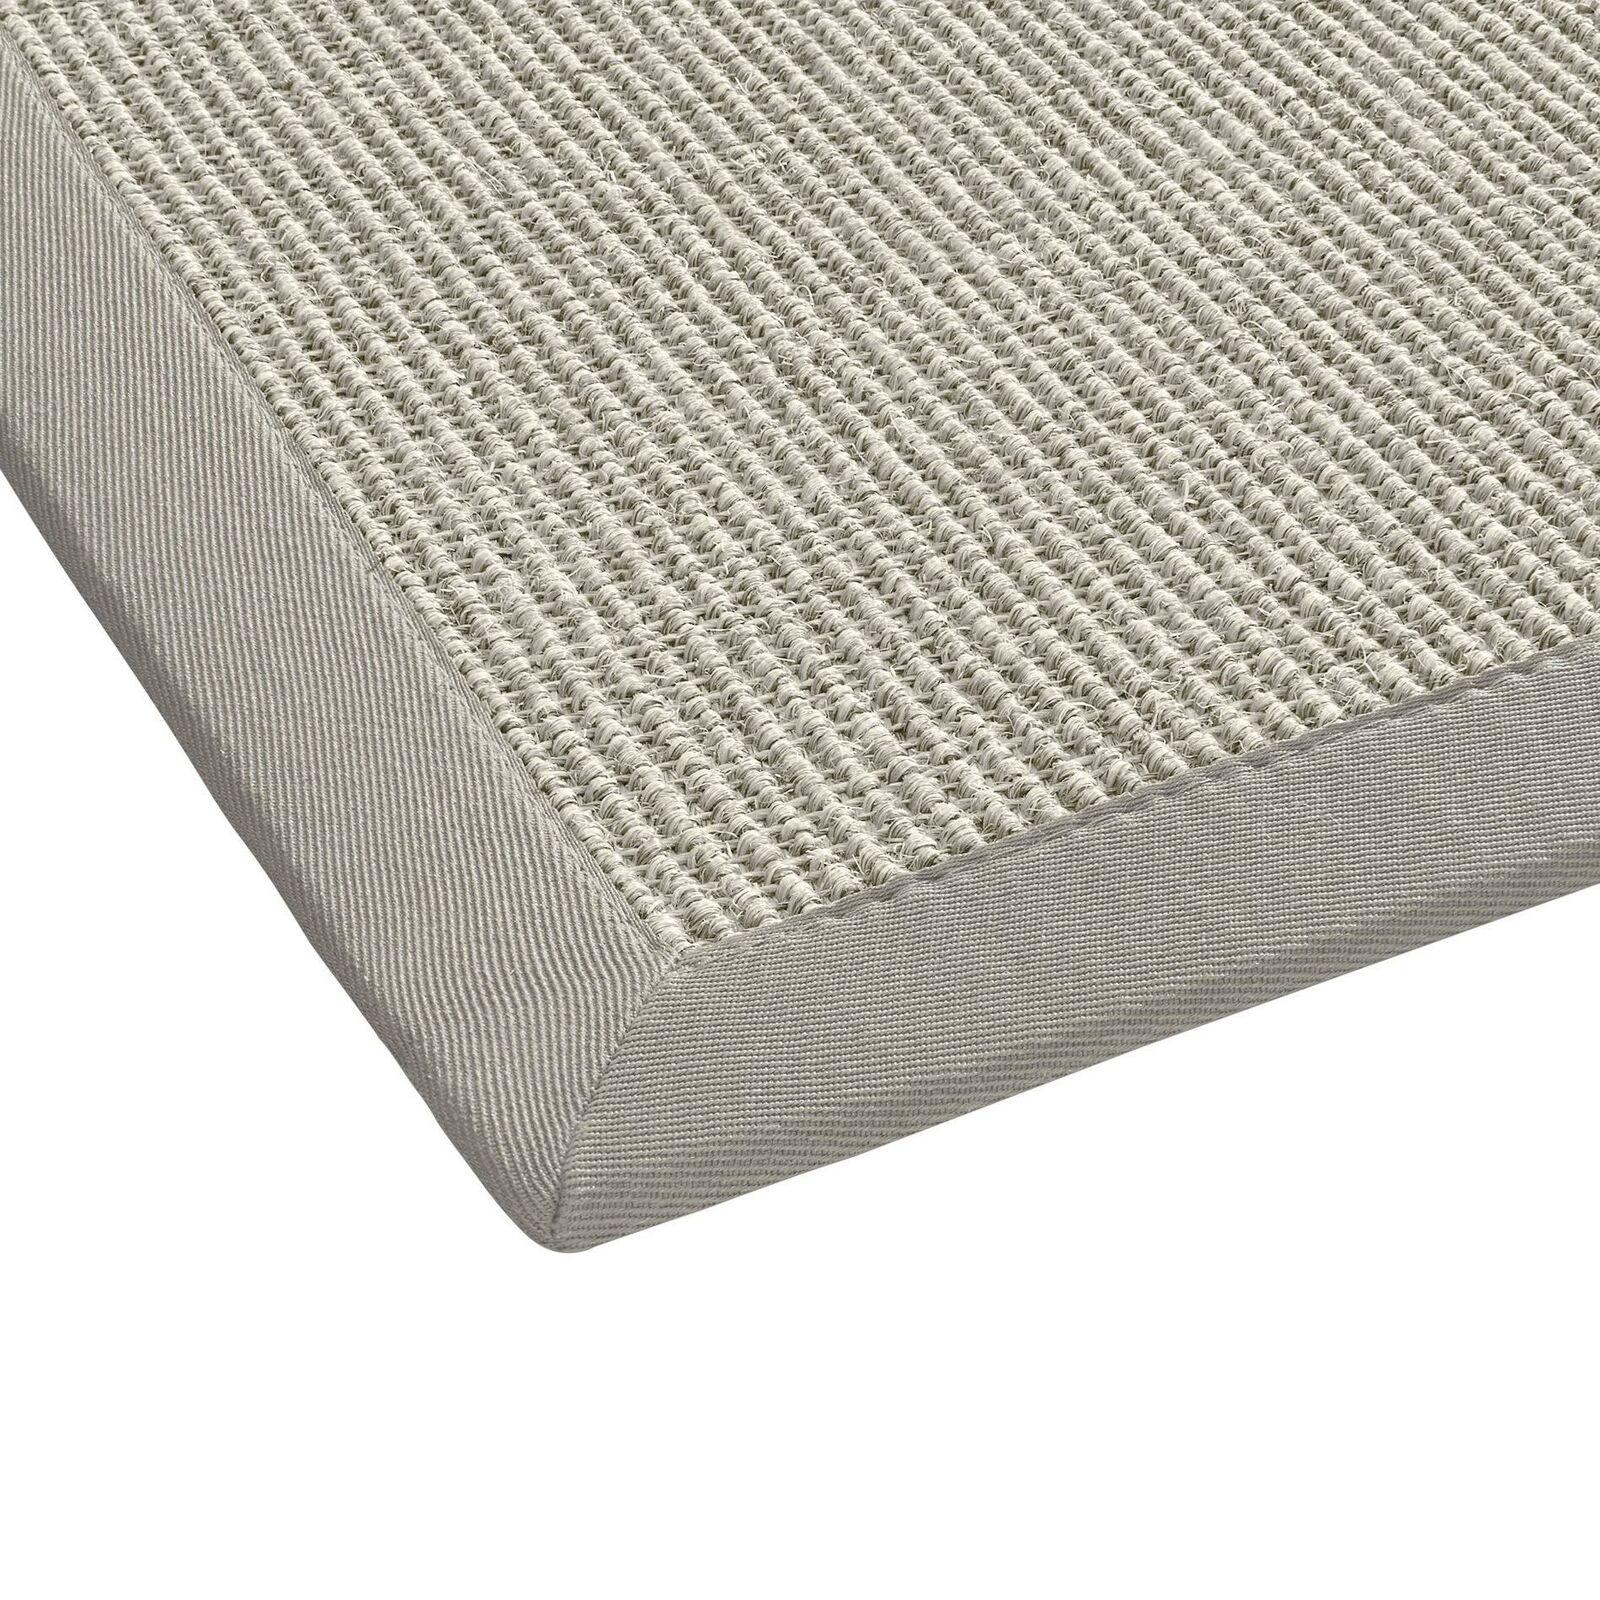 Sisal-Teppich Flachgewebe  hochwertig genähte Bordüre  9 Gr.  grau Weißs natur